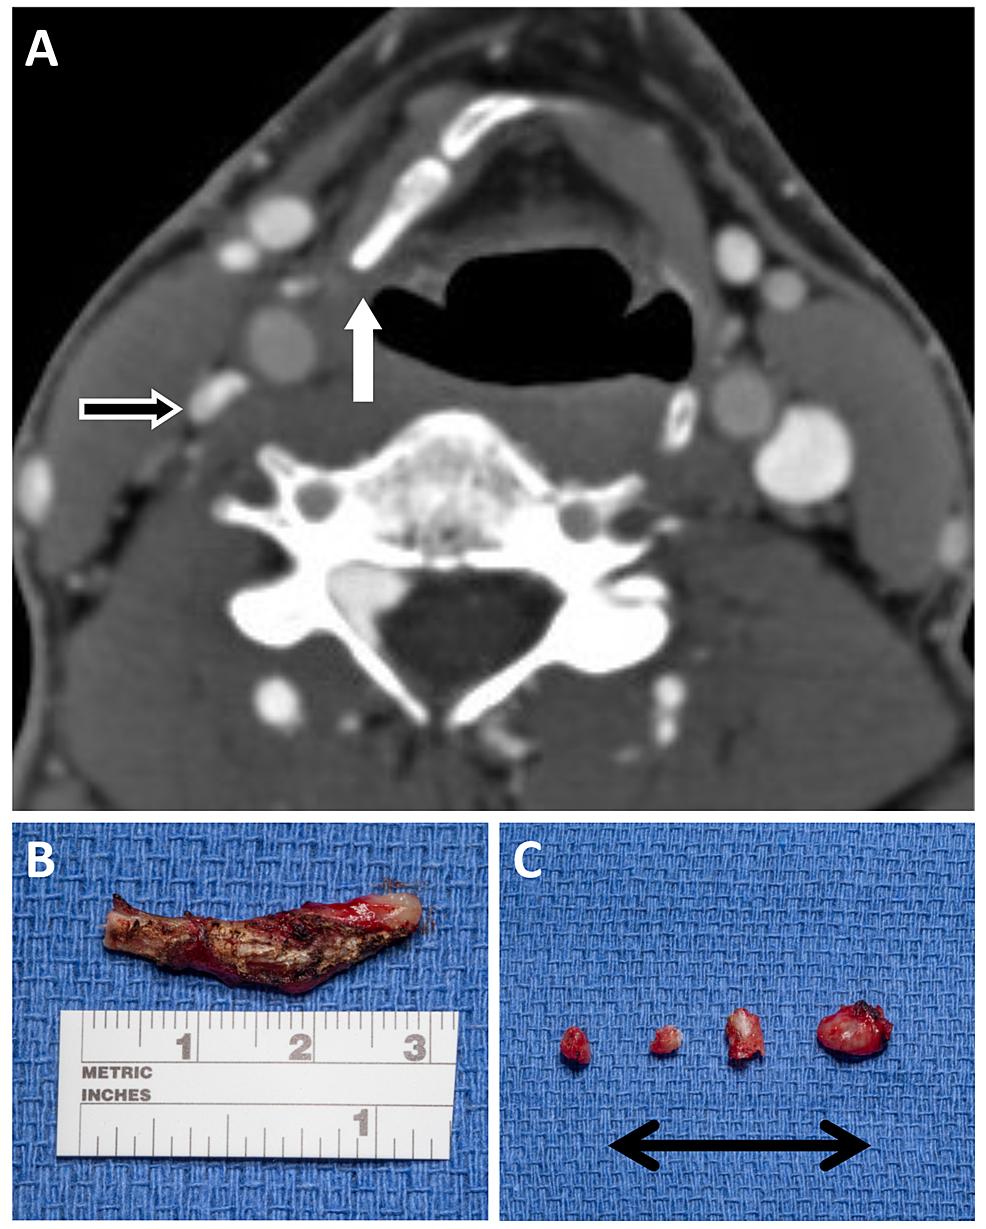 Postoperative-venogram-and-intraoperative-pathology.